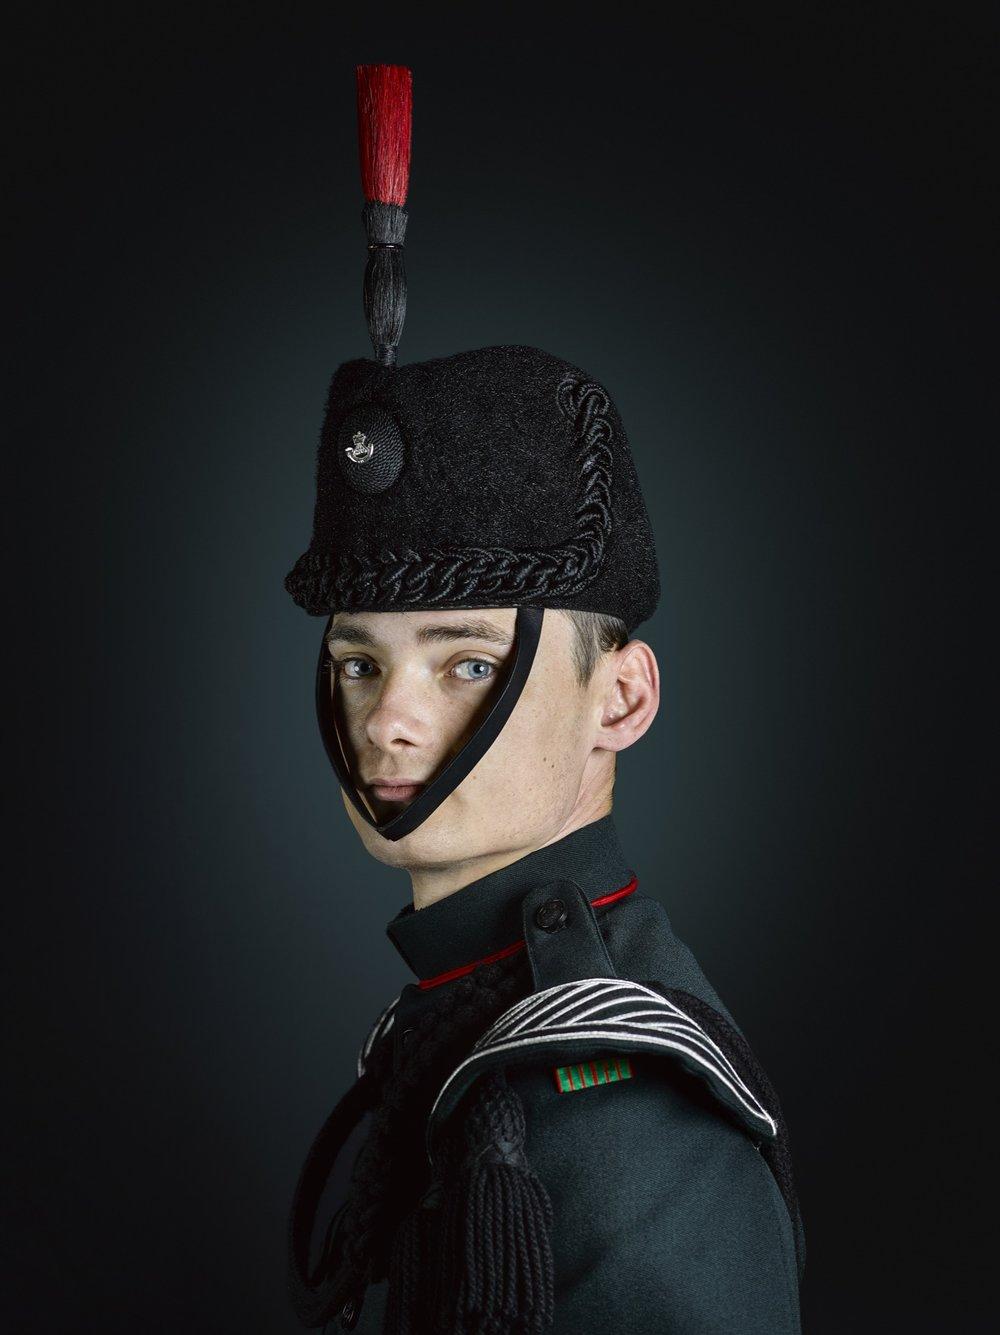 Rifleman Armour 1st Battalion The Rifles